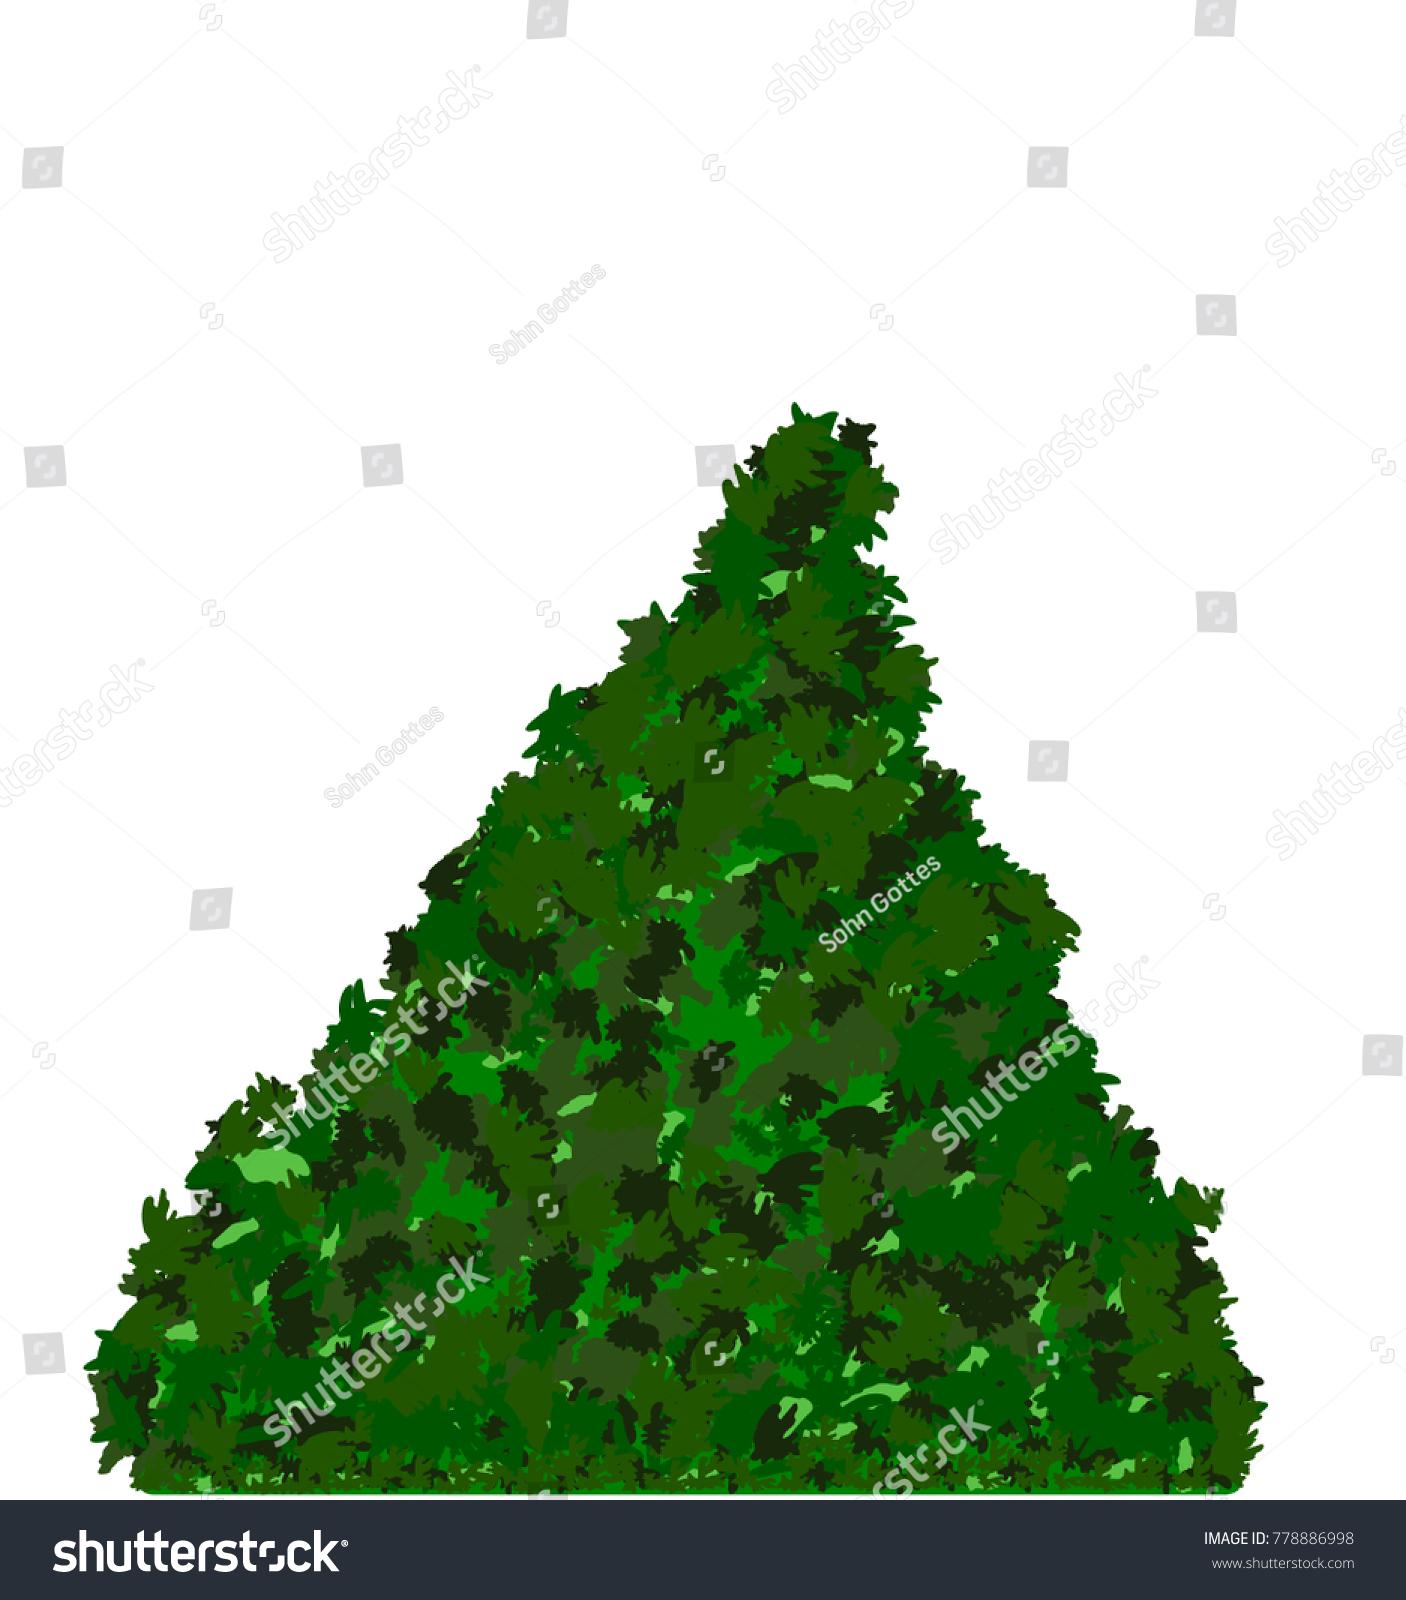 stock-vector-merry-christmas-tree-plain-